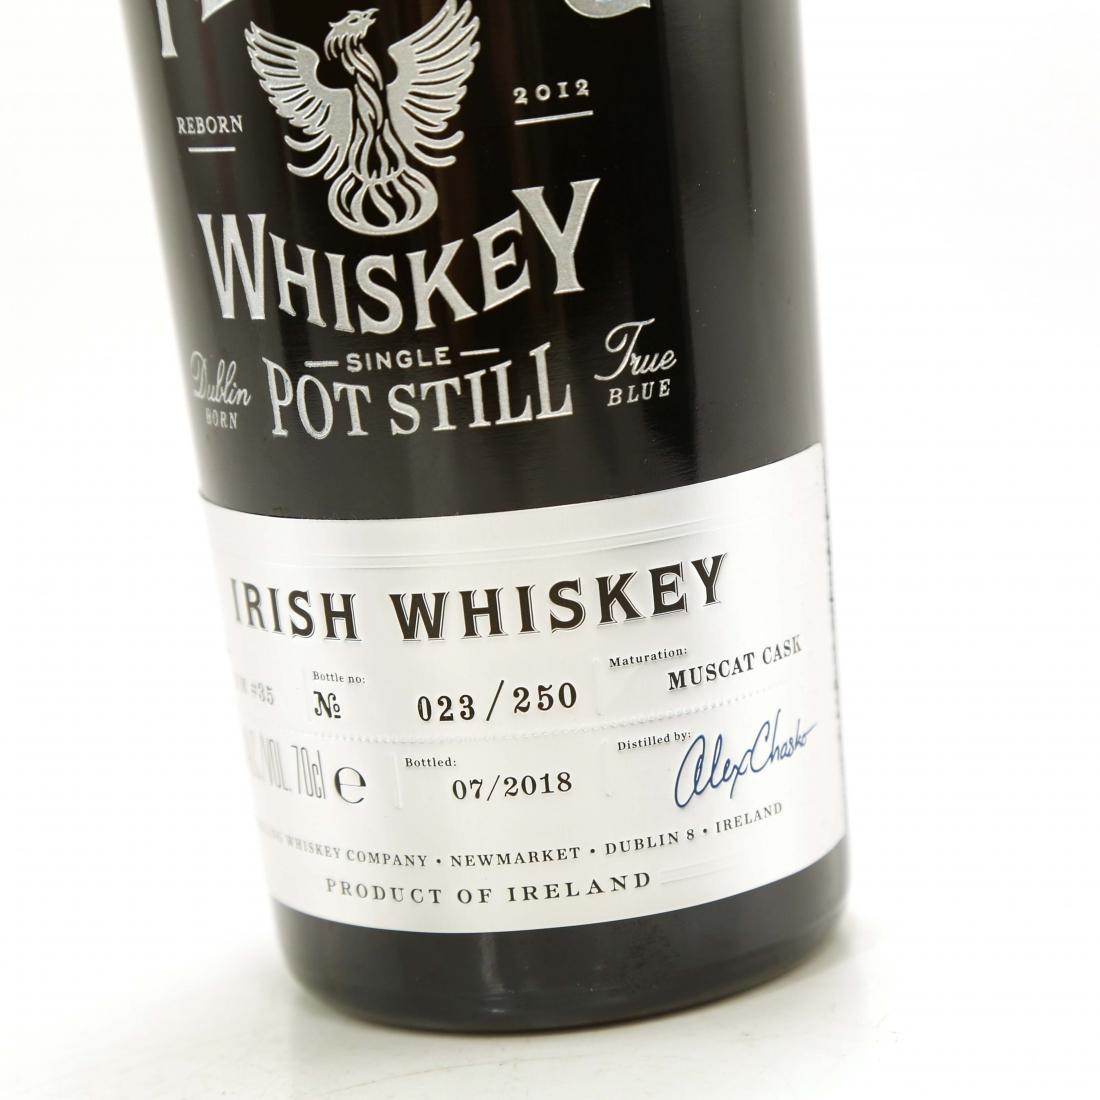 Teeling Celebratory Single Pot Still Whiskey / Bottle #023